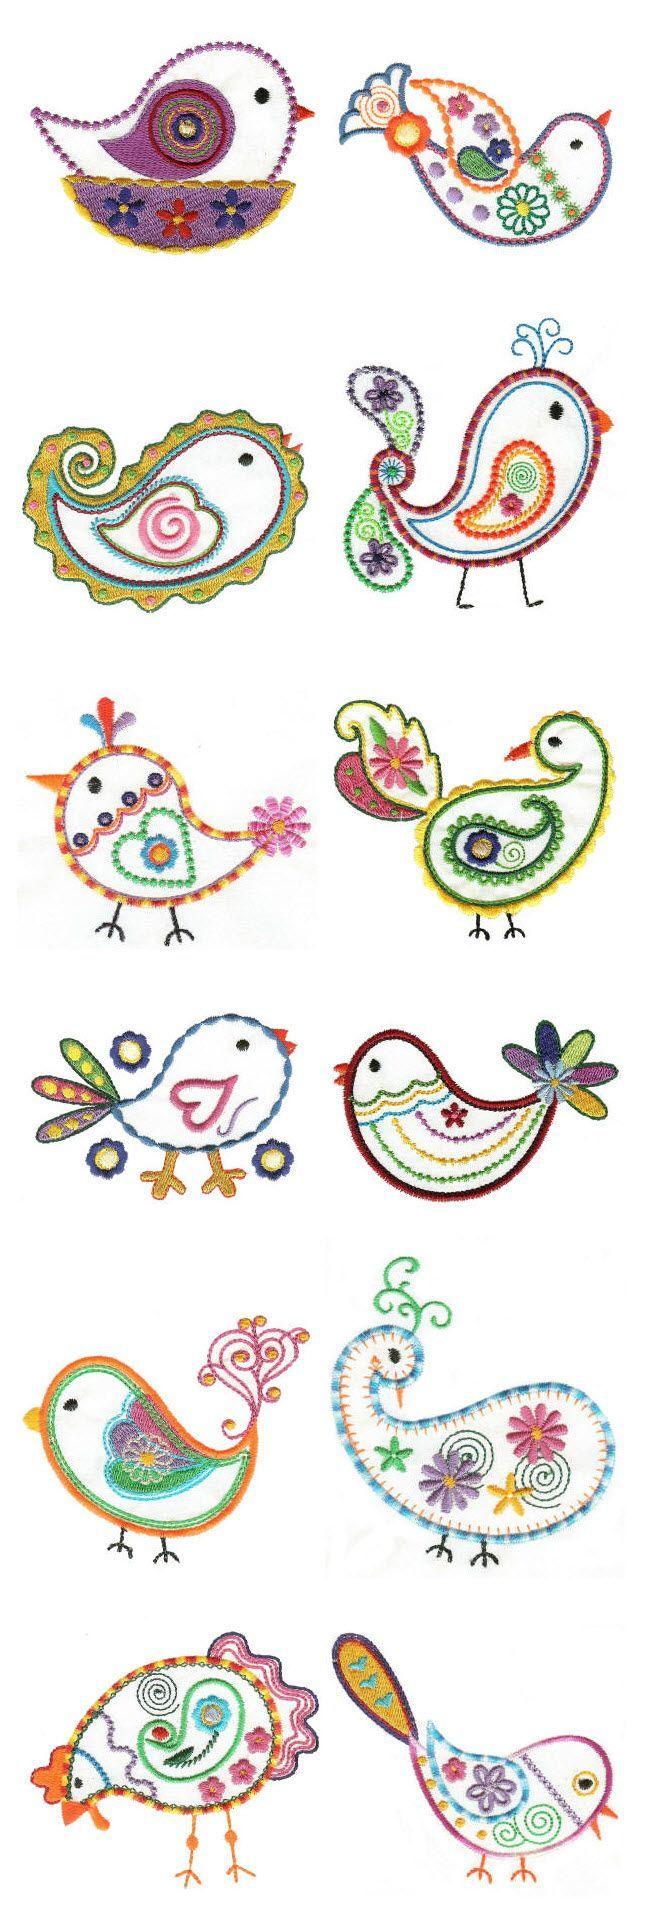 Casa de Retalhos: Para se inspirar  ♥  Inspiring patterns.